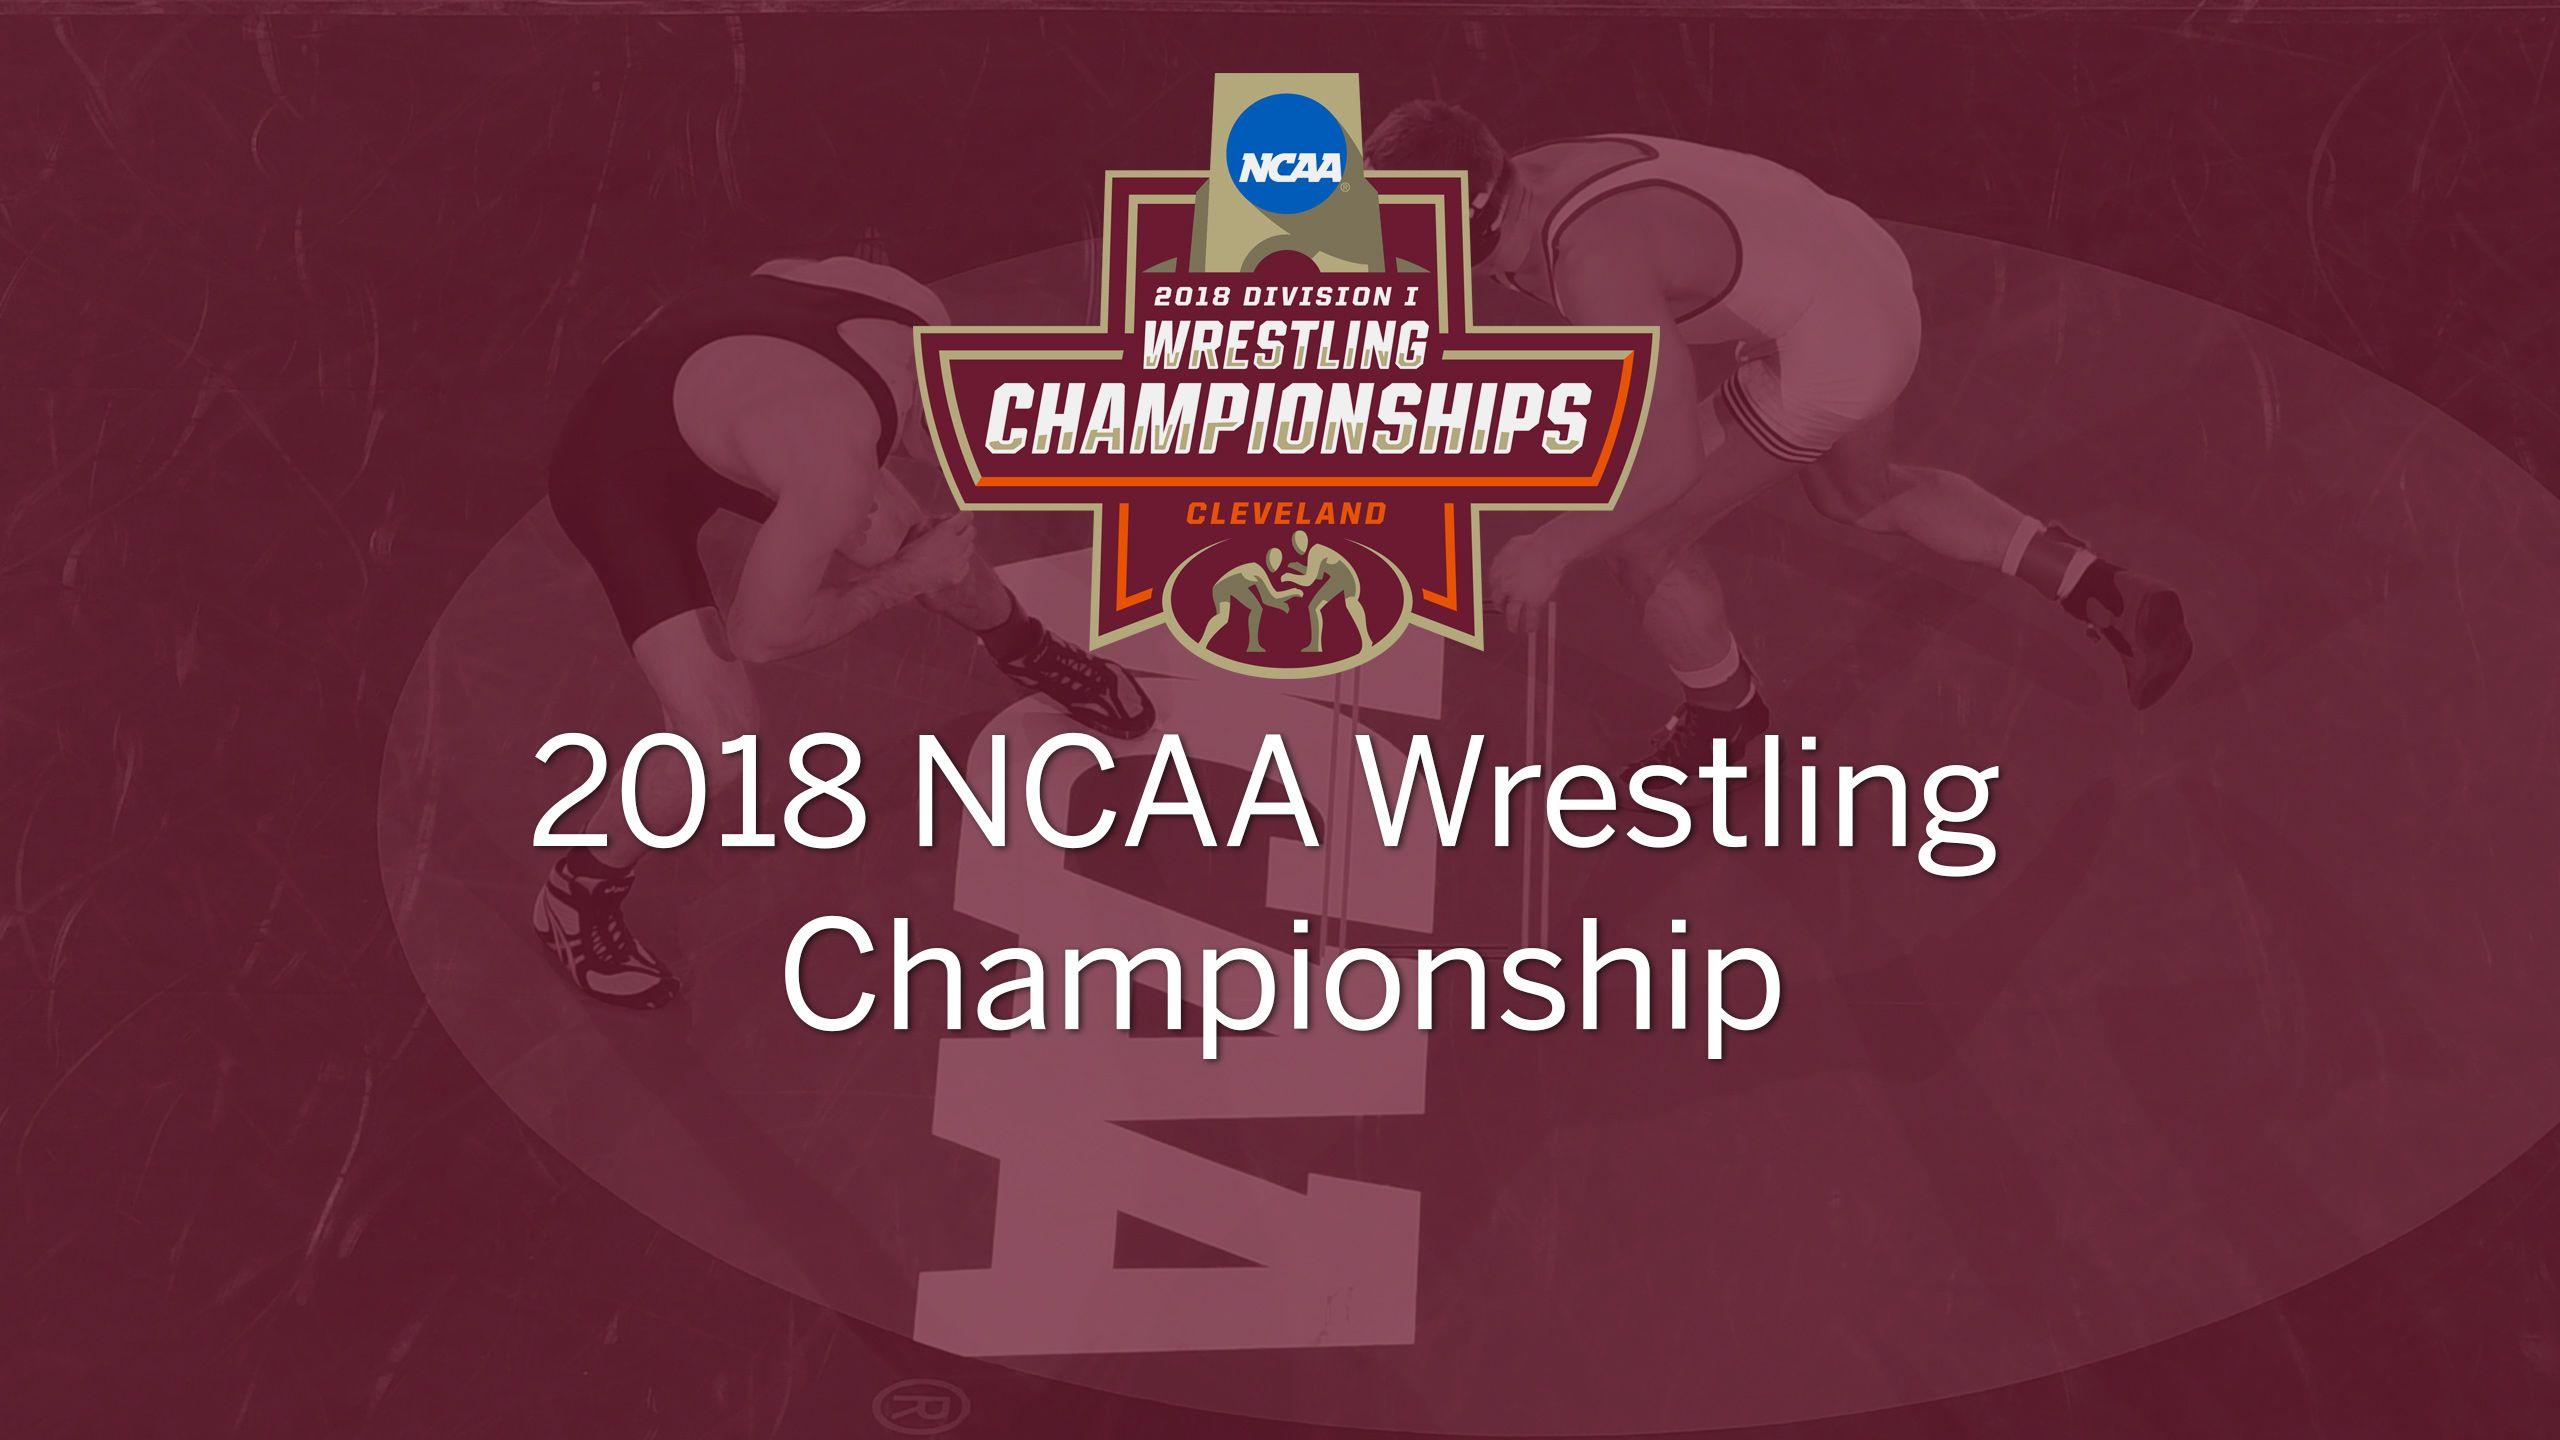 2018 NCAA Wrestling Championship (Quarterfinals)